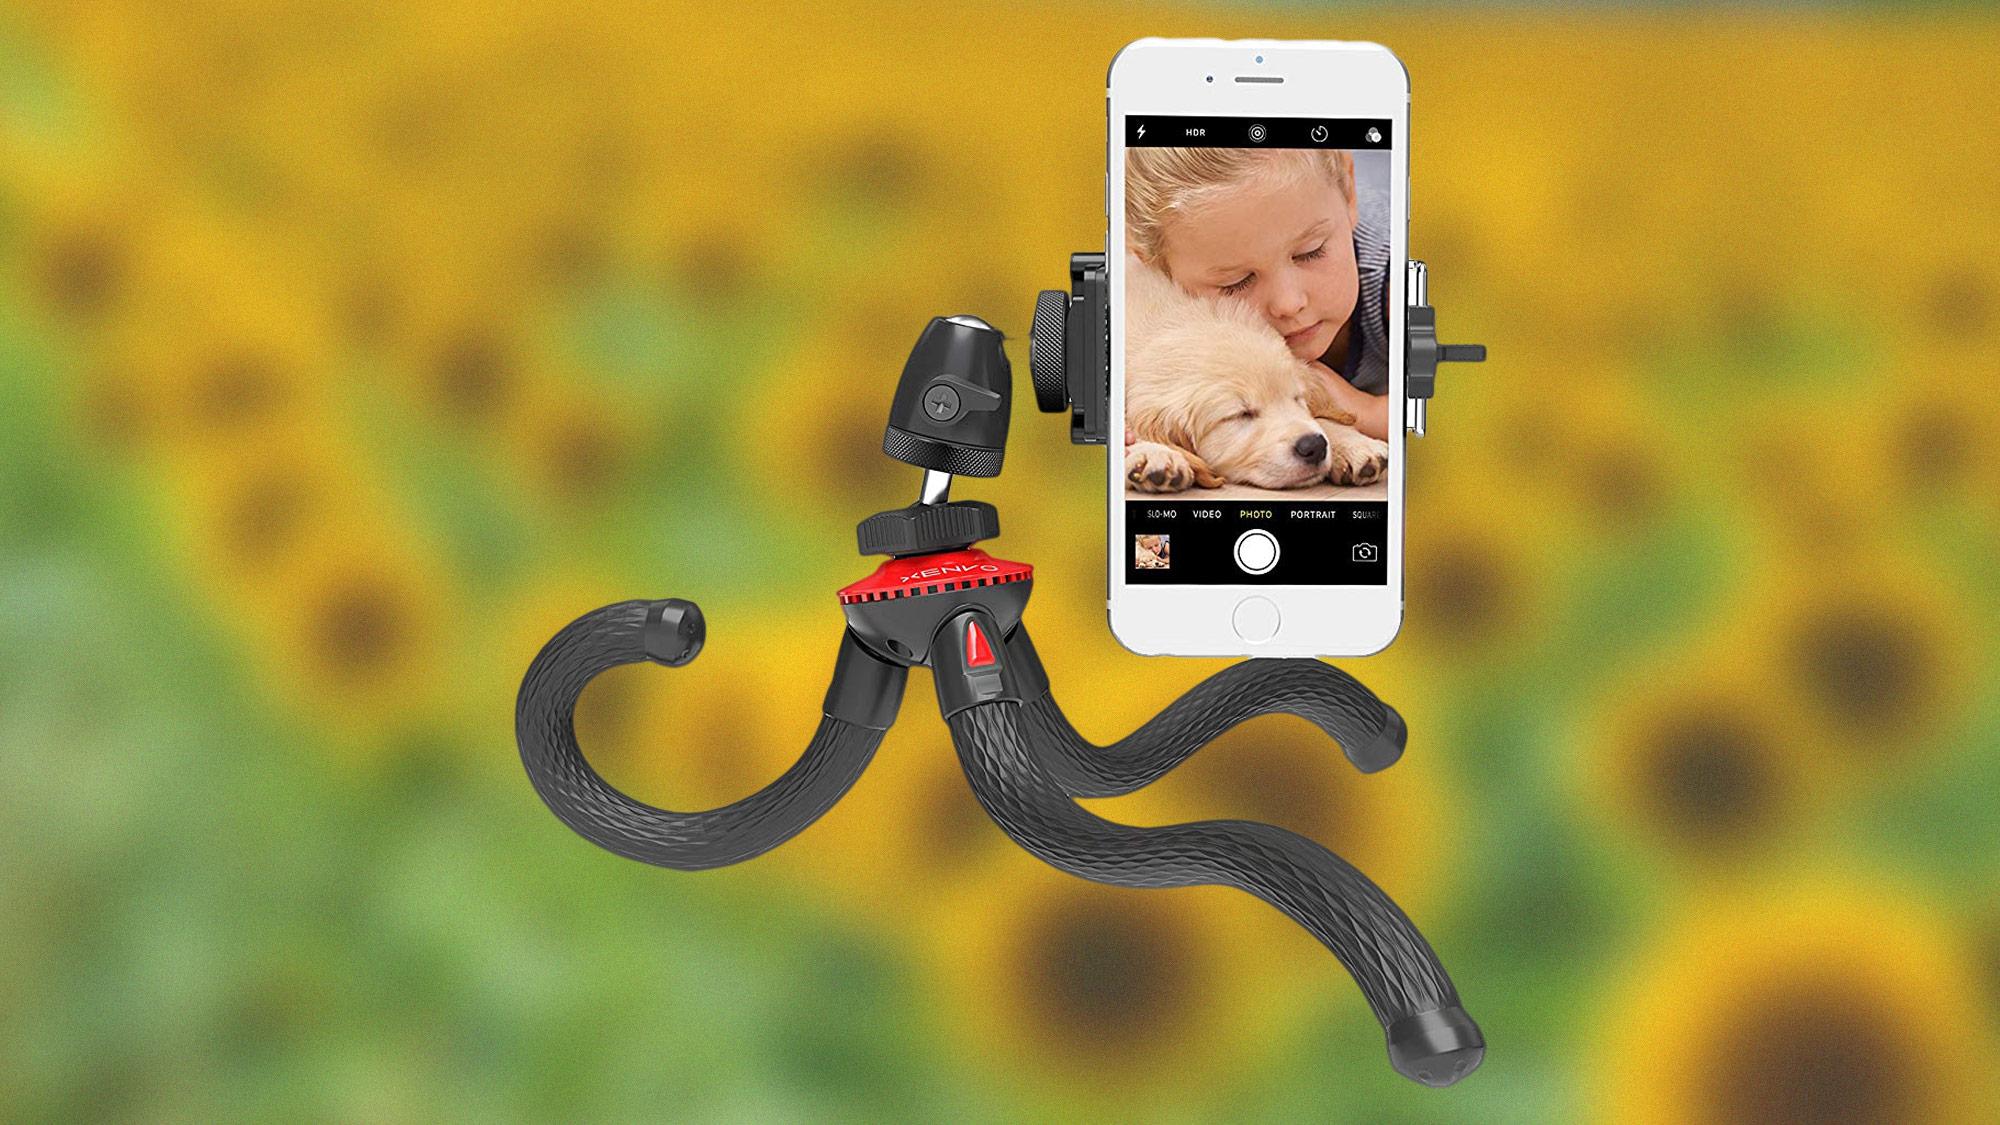 best iPhone tripods: Xenvo SquidGrip tripod